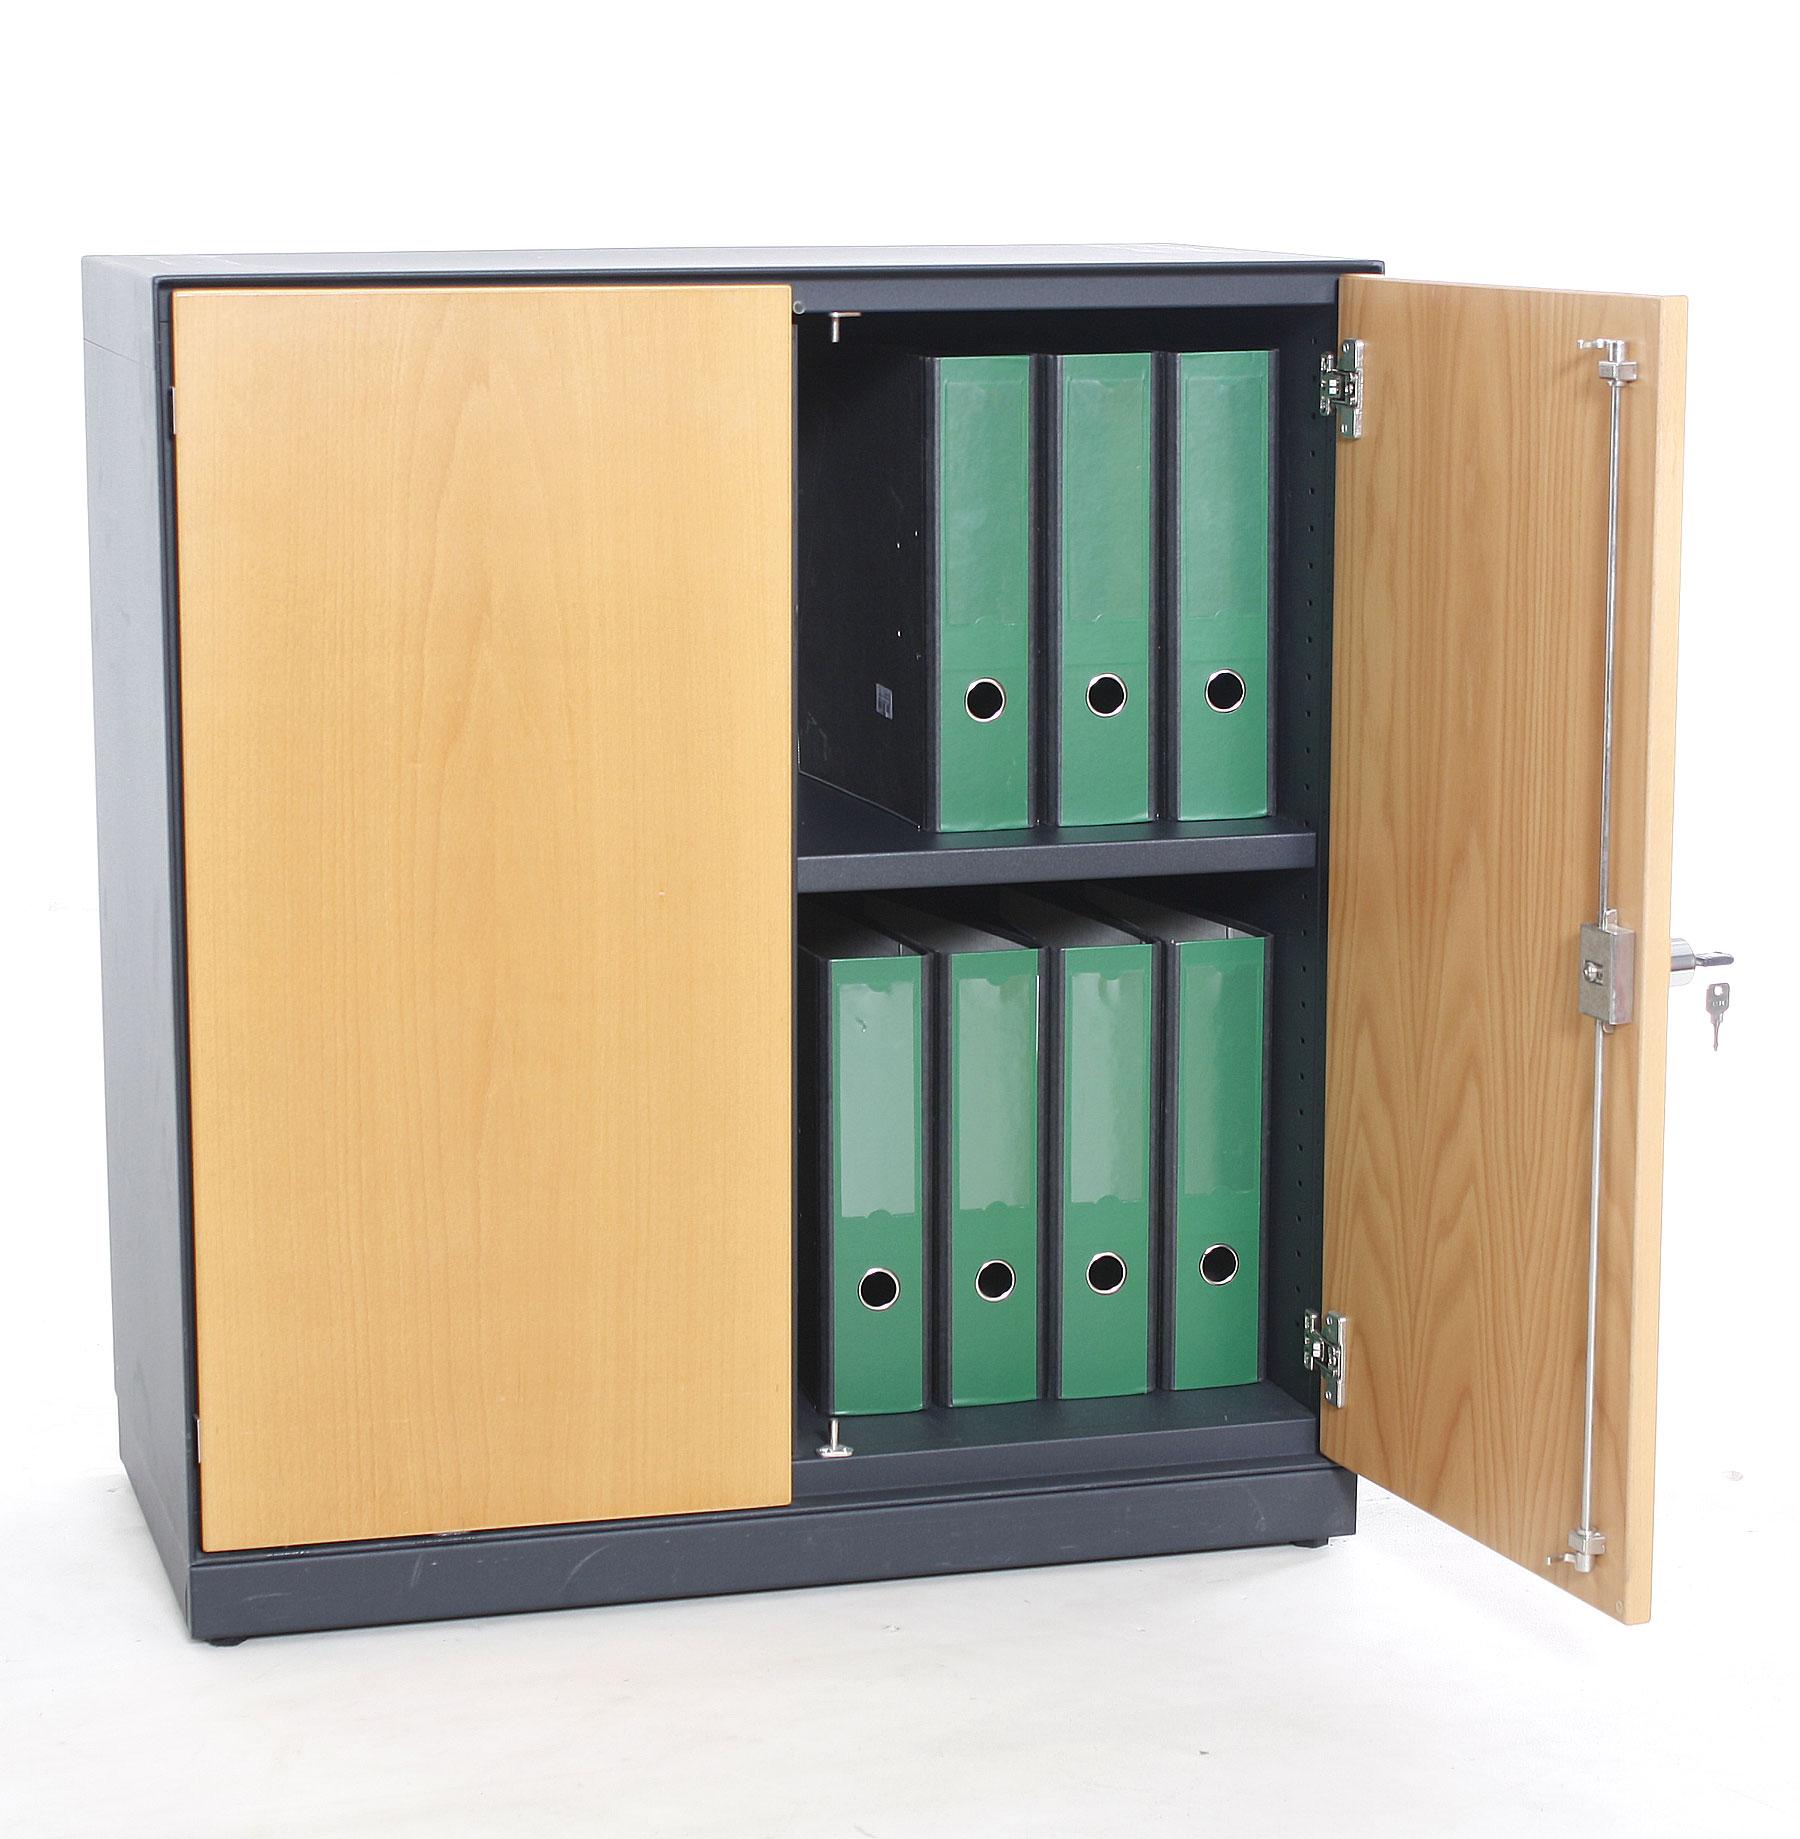 sideboard 2oh vitra b 80 x h 88 x t 42 cm gebrauchte b rom bel 100 cm breite. Black Bedroom Furniture Sets. Home Design Ideas